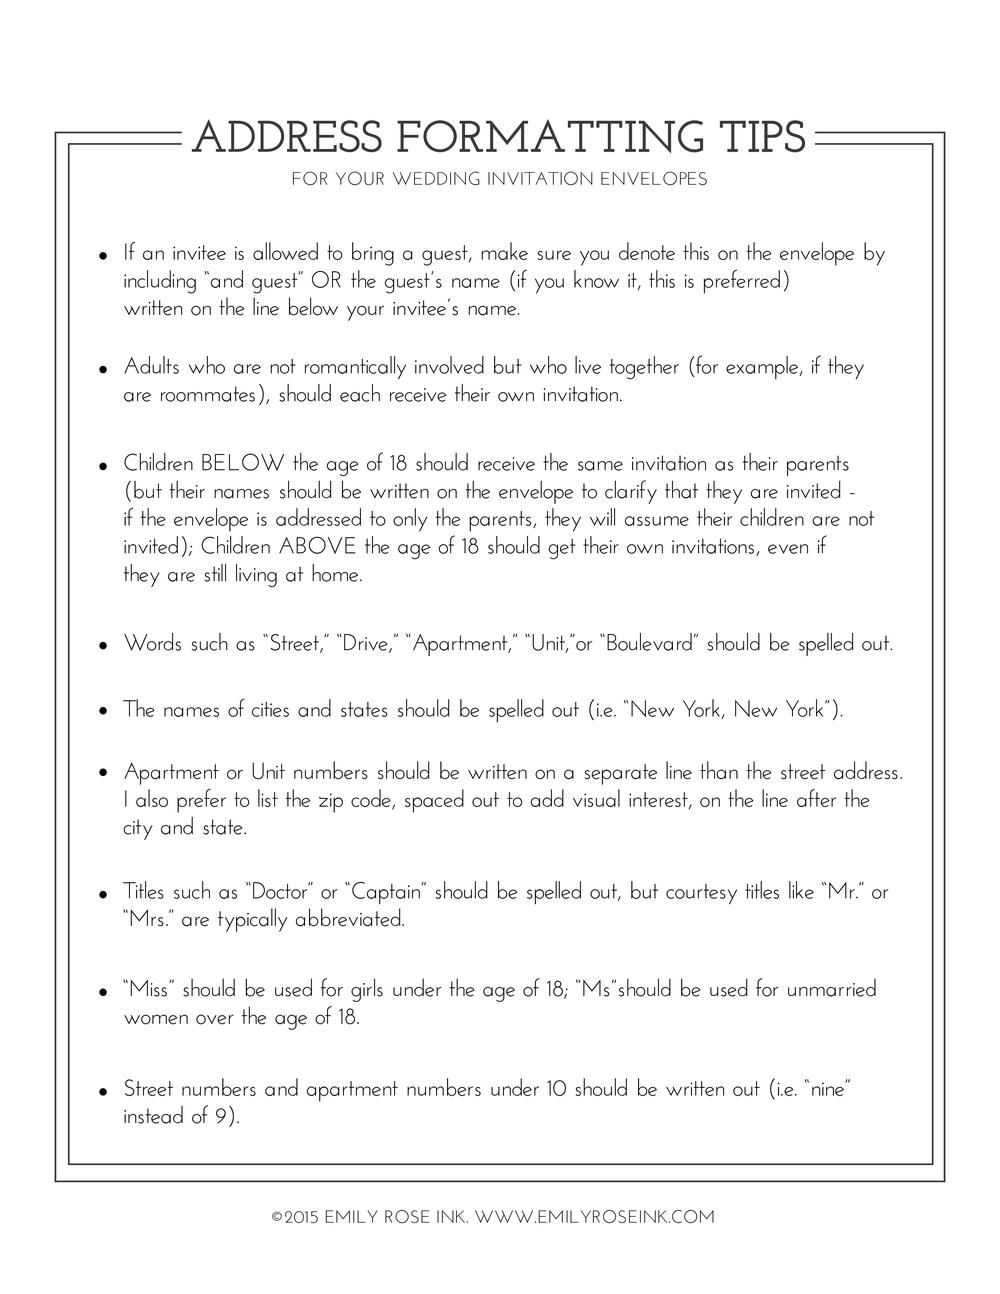 Envelope Addressing Etiquette | Envelope printing, Guest list and ...